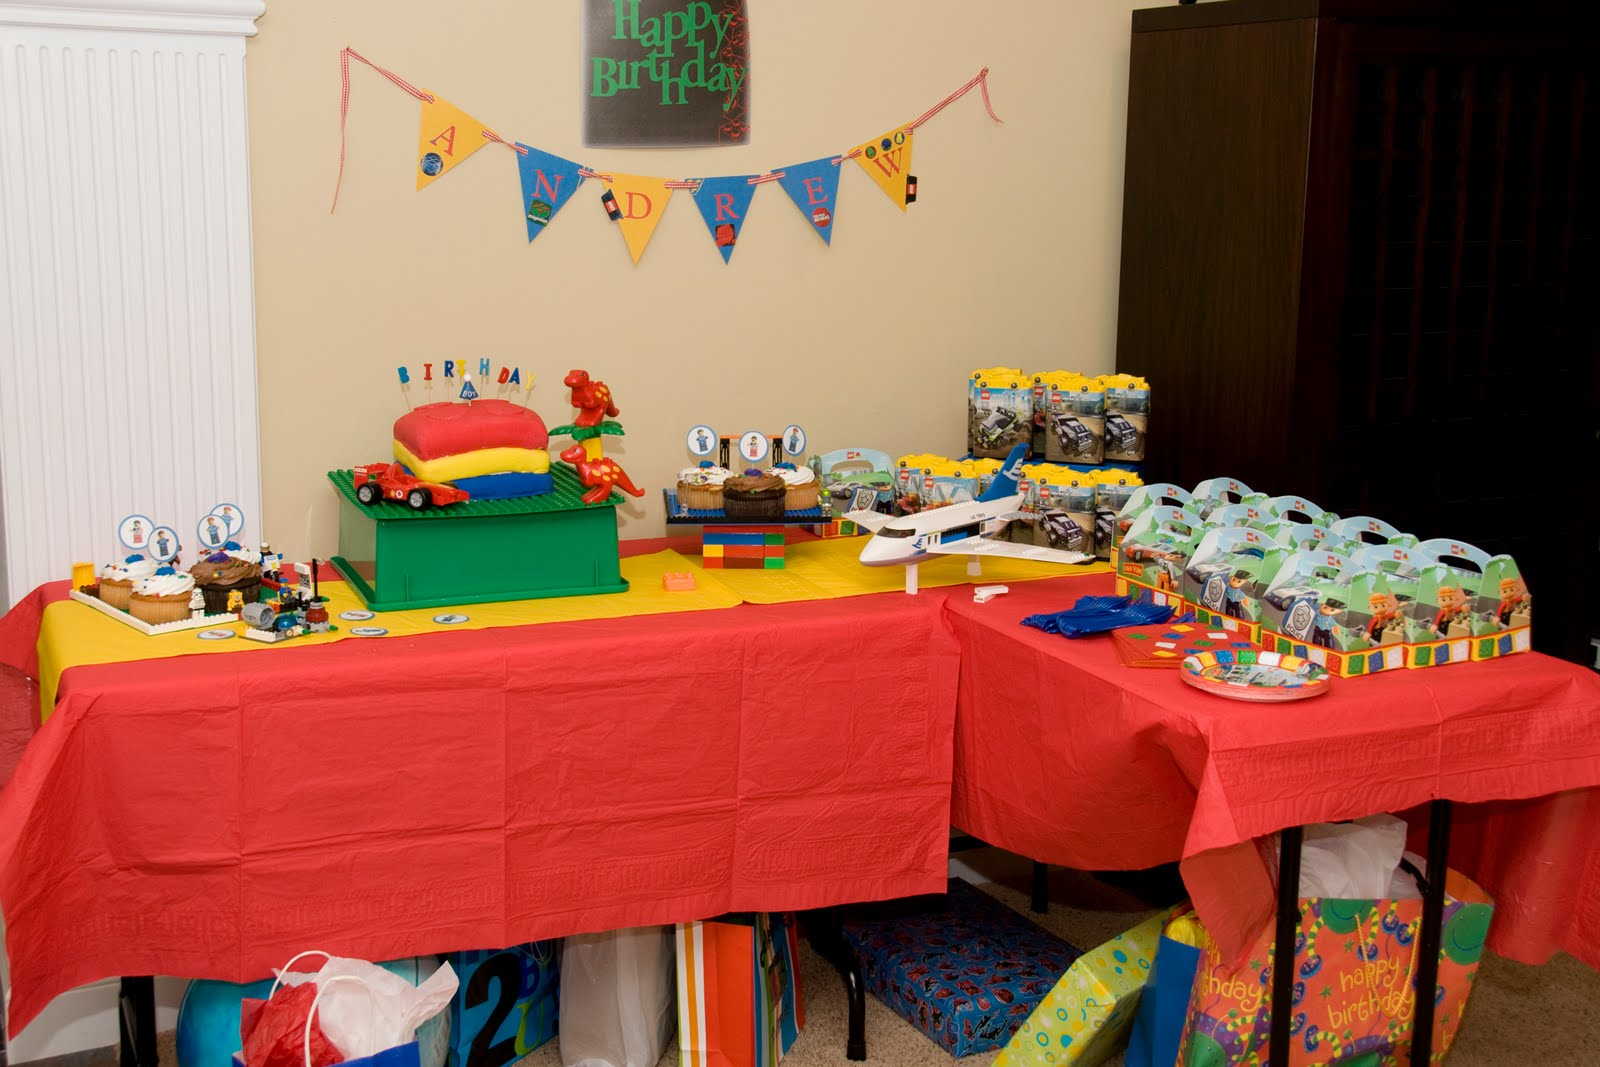 Lego birthday party the polkadot chair